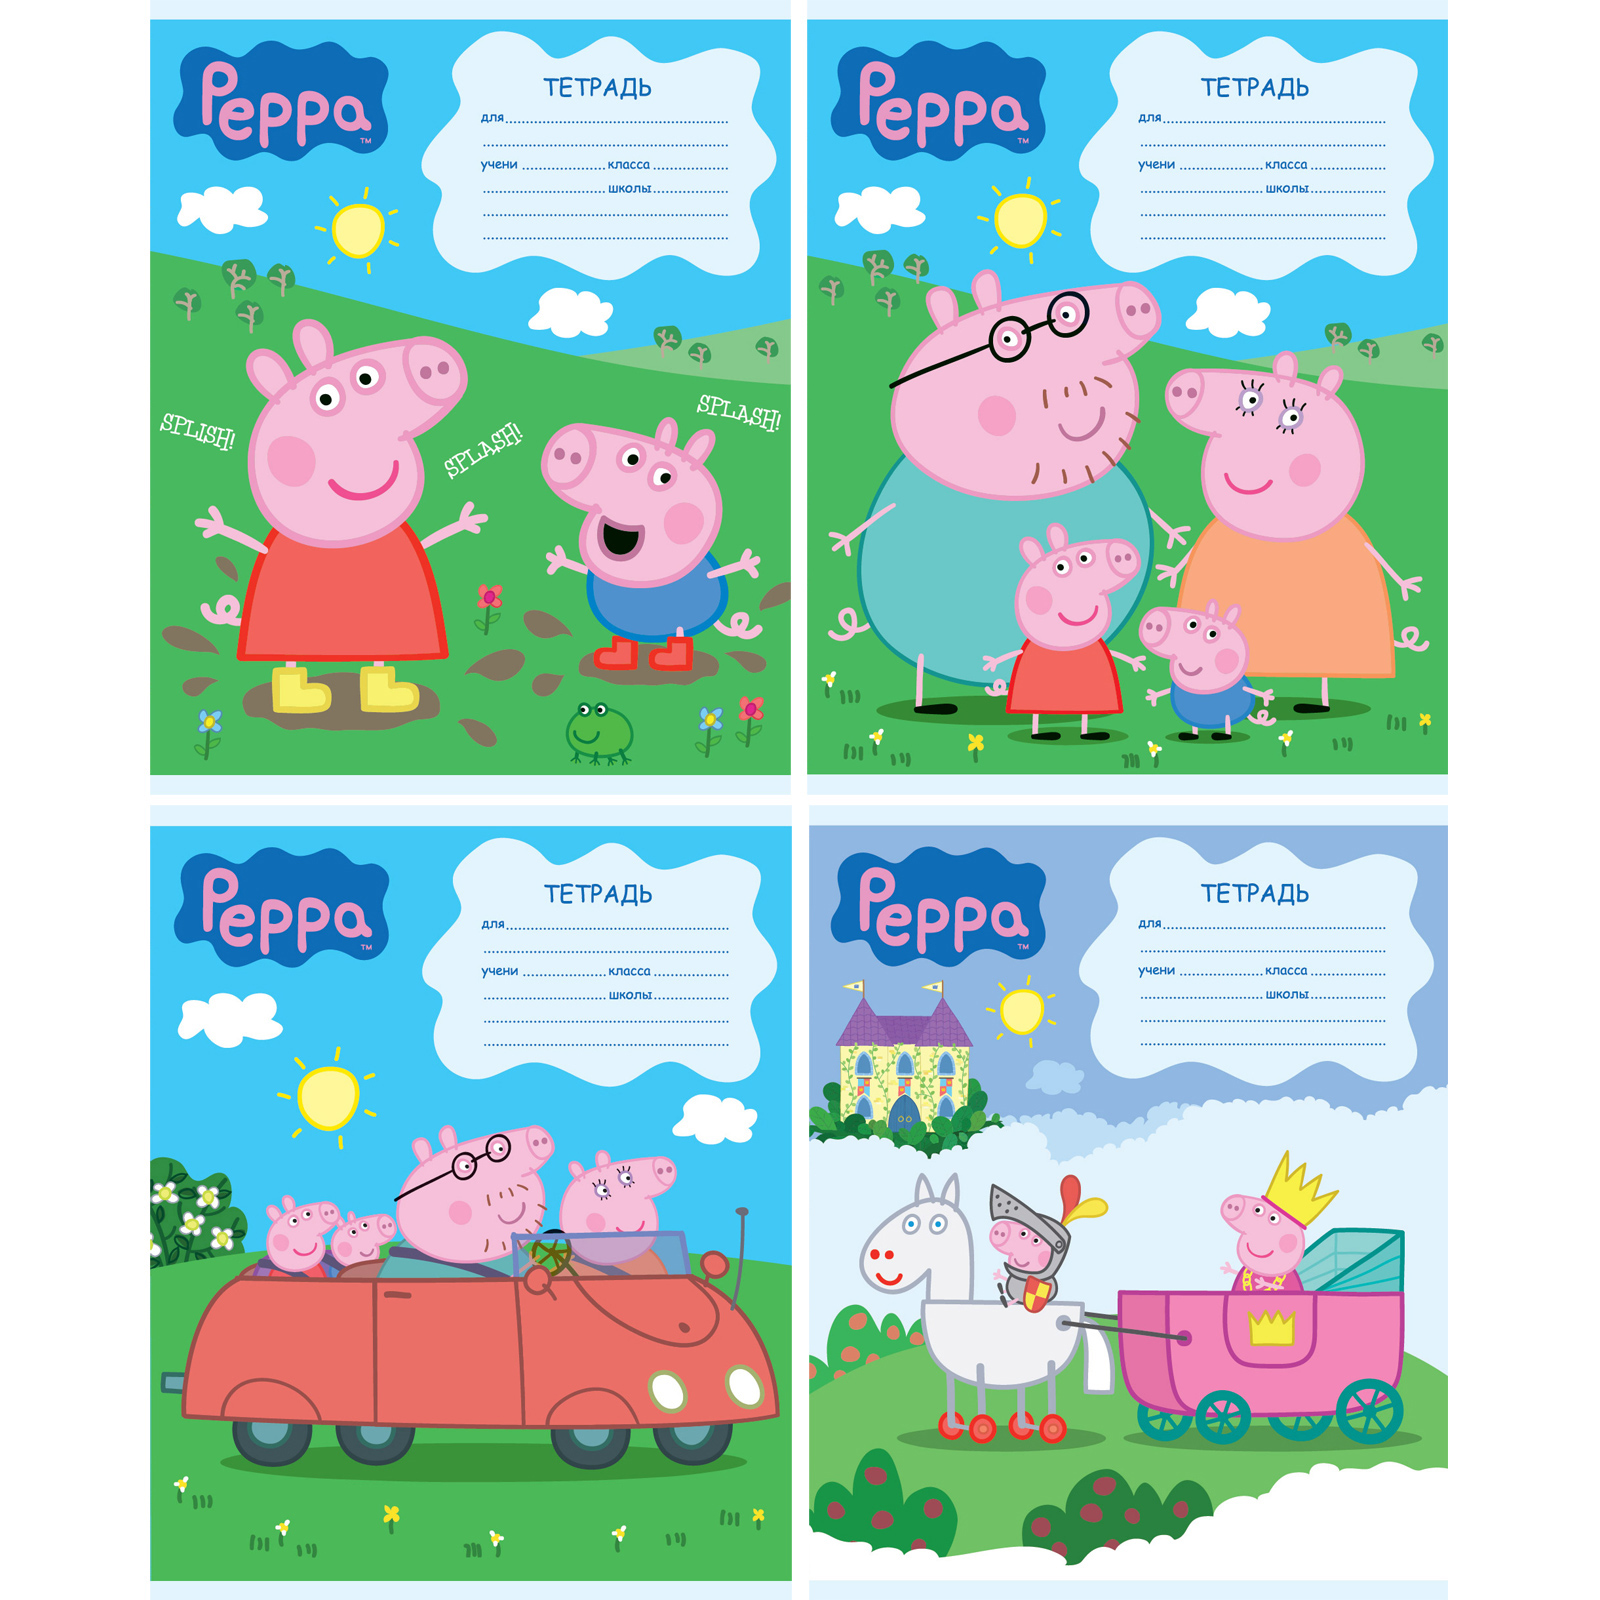 Тетрадь 12 листов линейка «Свинка Пеппа»Тетради<br>Тетрадь 12 листов линейка «Свинка Пеппа»<br>